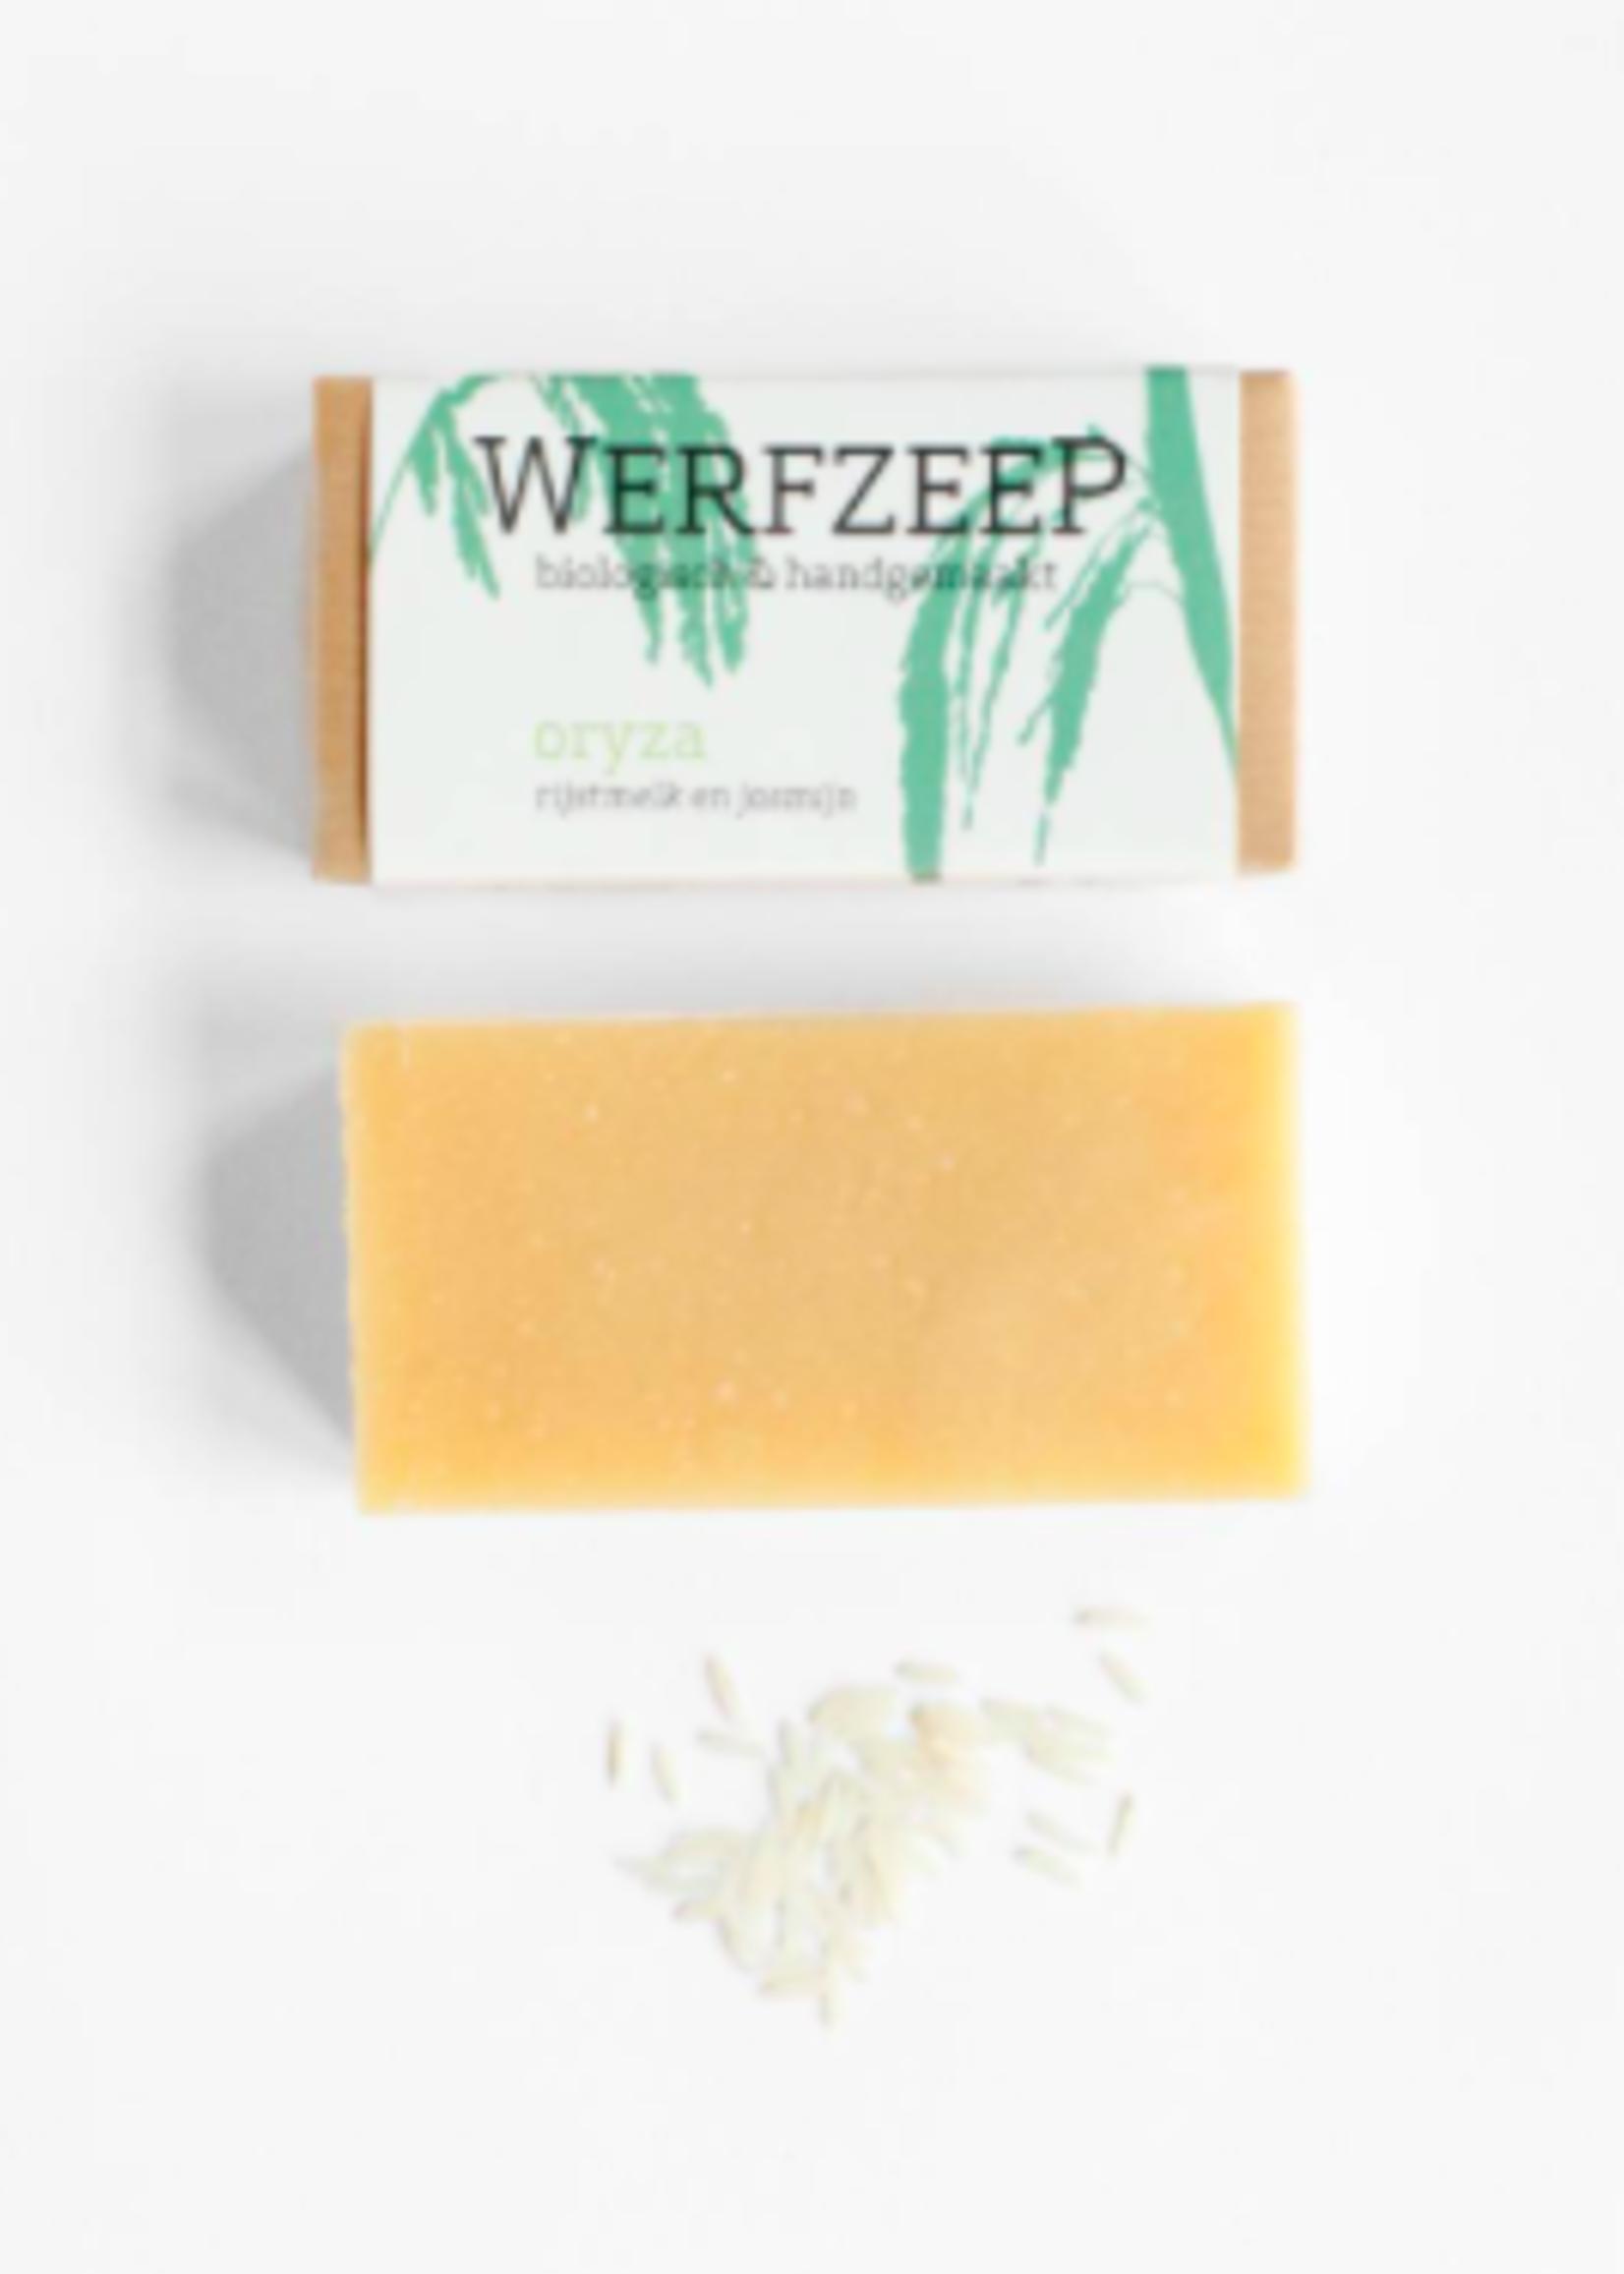 Werfzeep Organic & Handmade Soaps